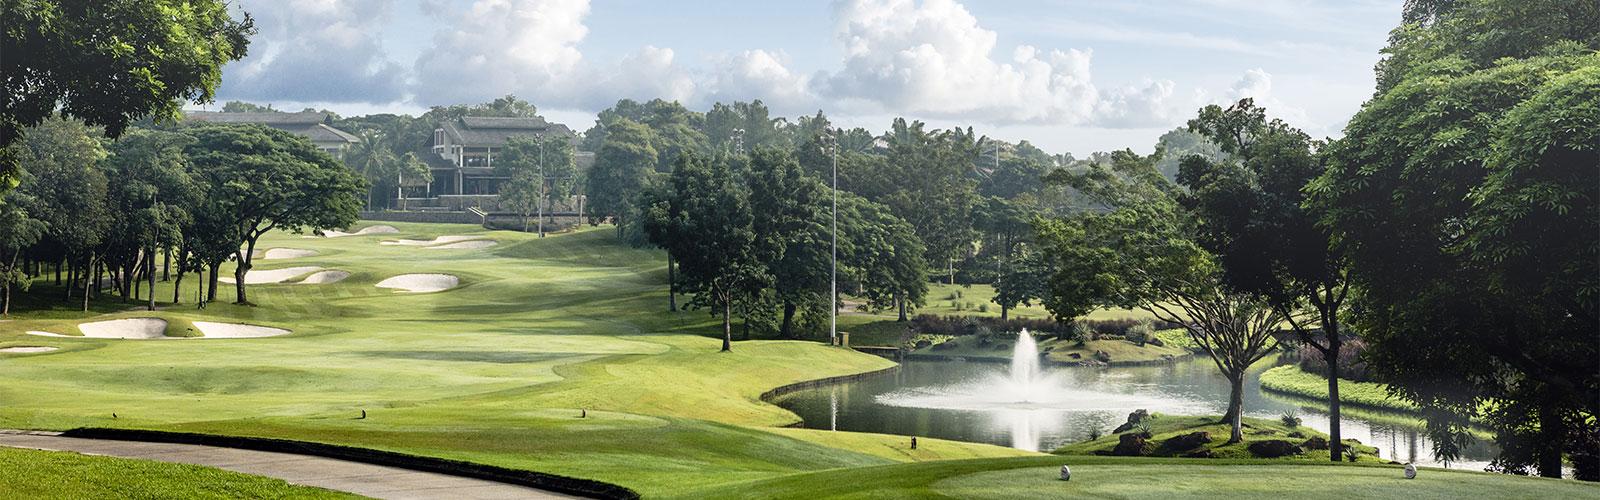 Kota Permai Golf Country Club